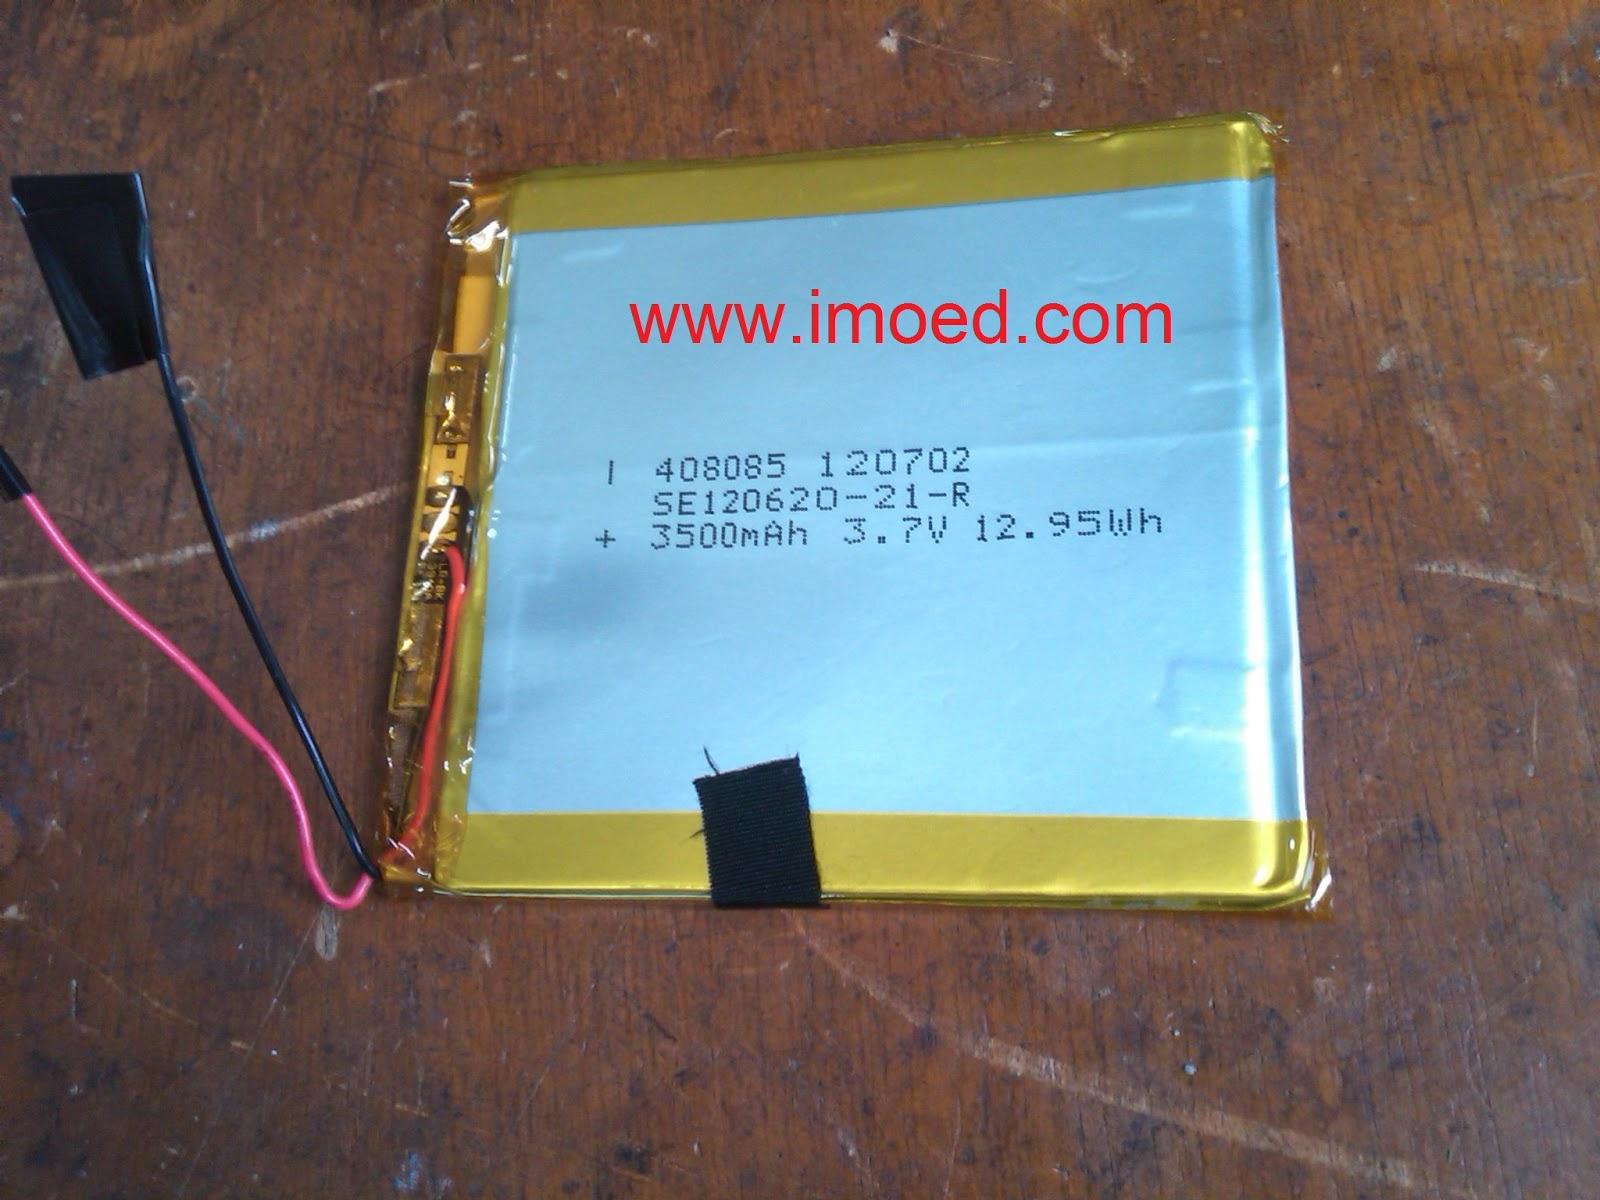 imoed yang penasaran dengan komponen dan hardware pada tablet treq